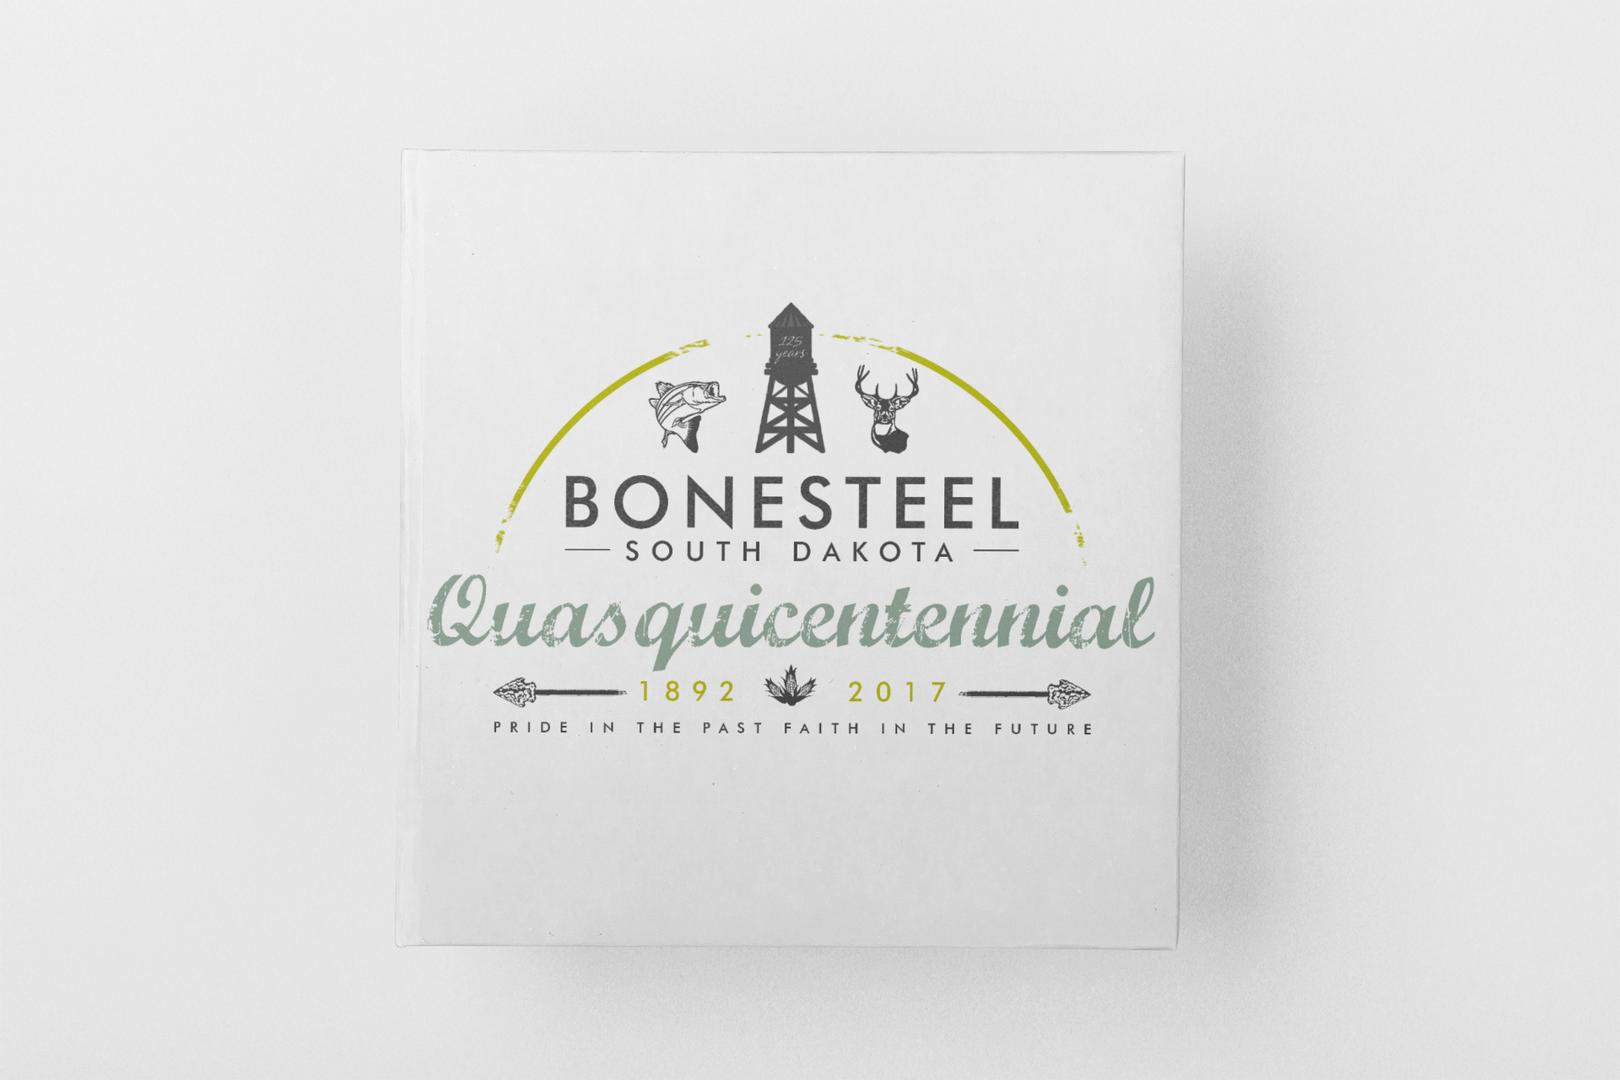 Bonesteel, South Dakota Q125